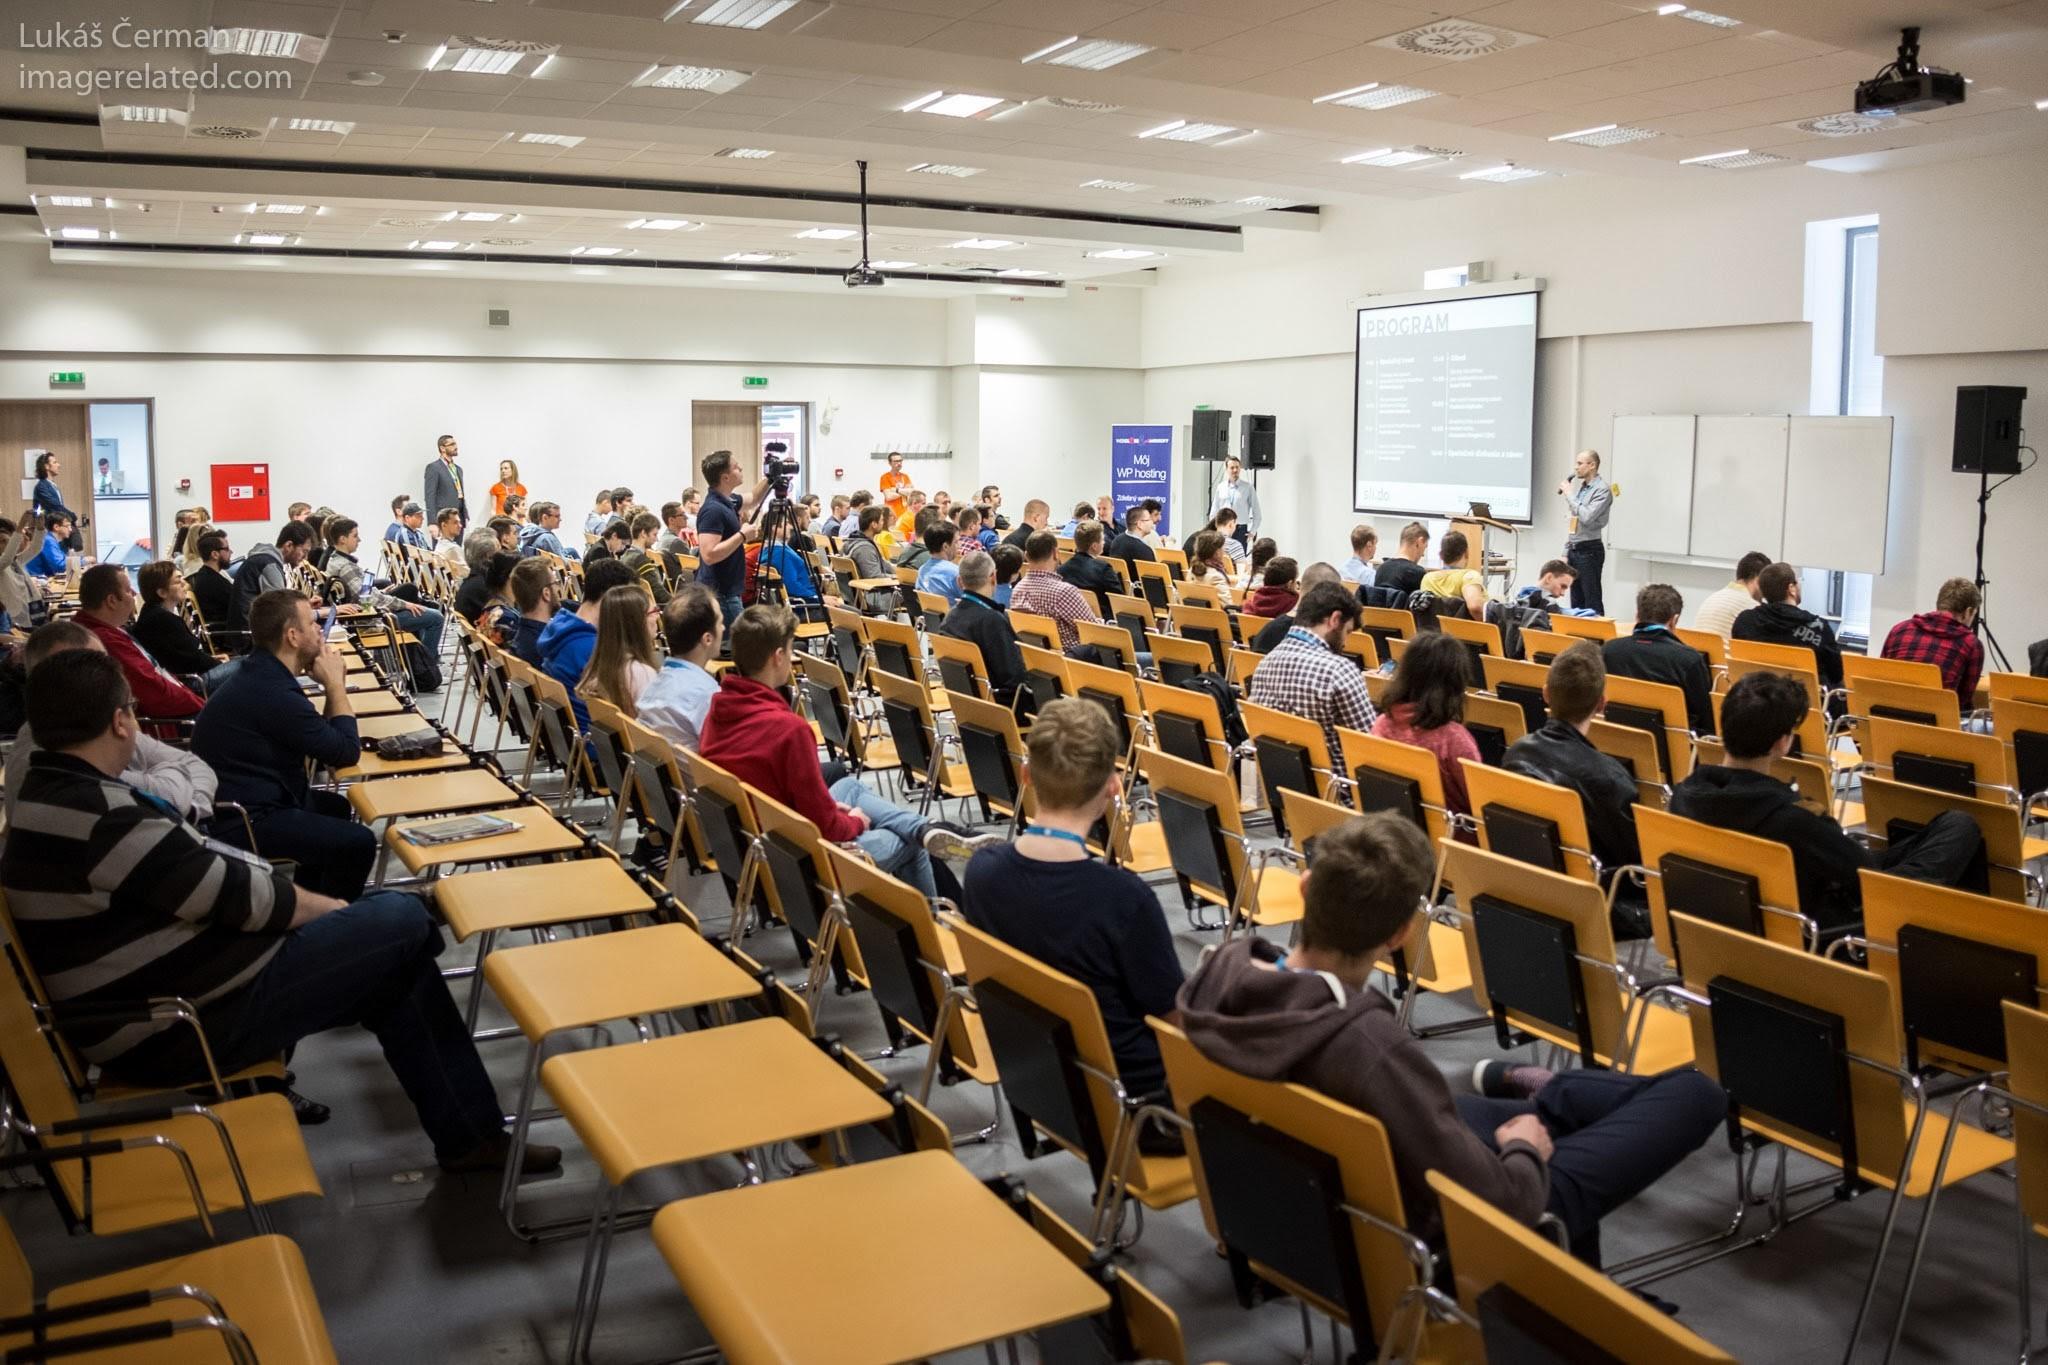 WordCamp 2016 (zdroj : 2016.bratislava.wordcamp.org)